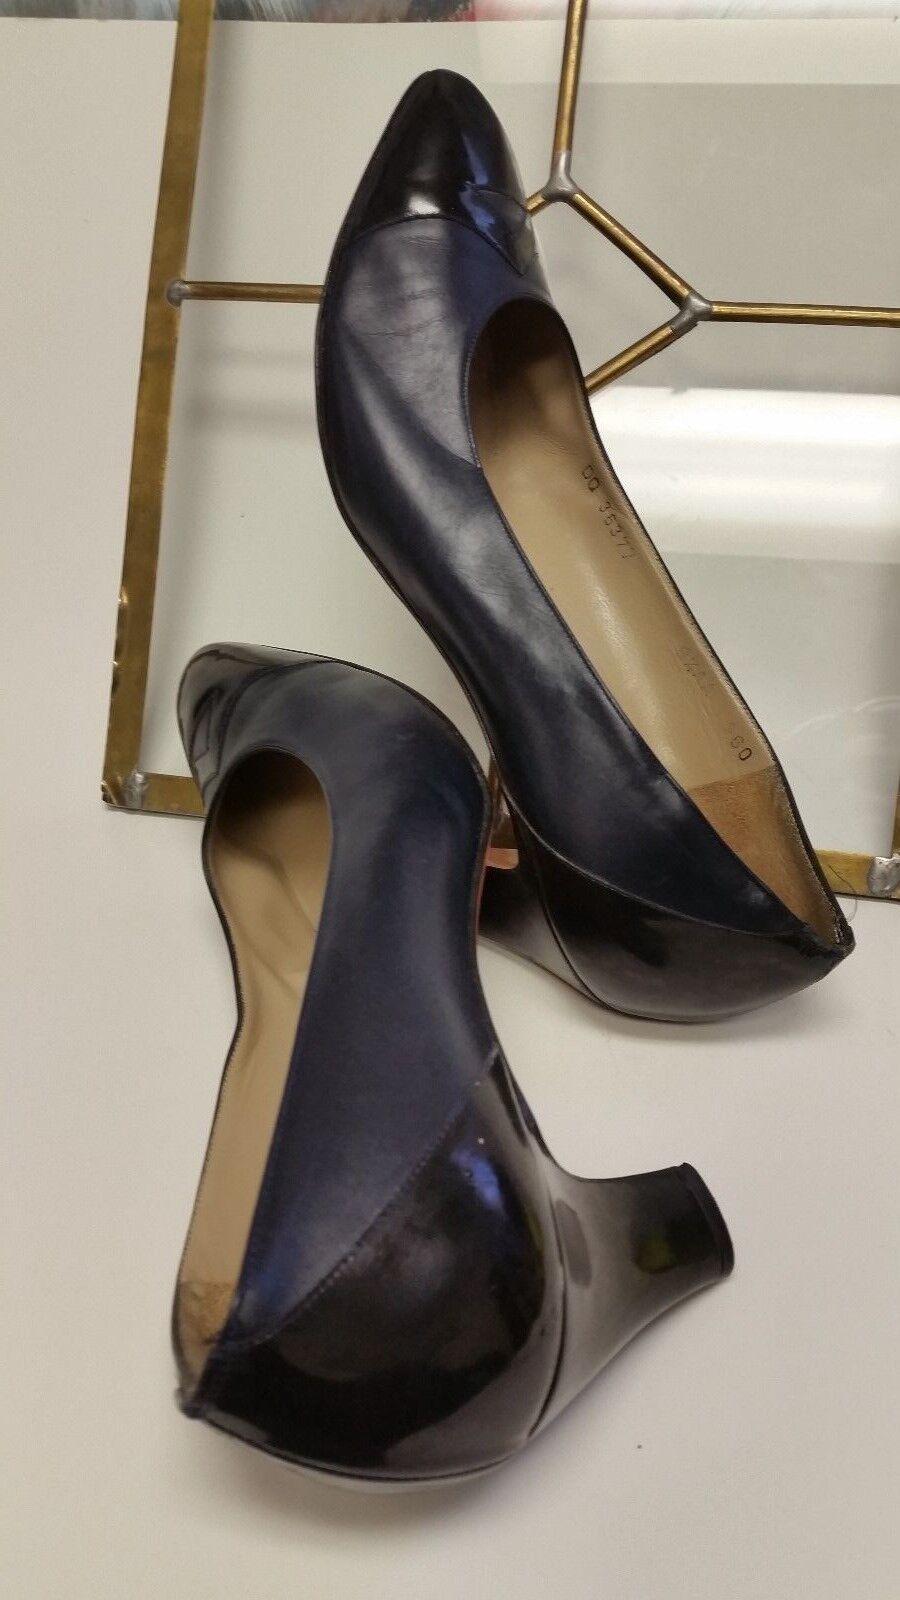 SALVATORE FERRAGAMO Heels Vintage Leather Classic Low Heels FERRAGAMO Shoes Size 9.5AA NICE d1dc14